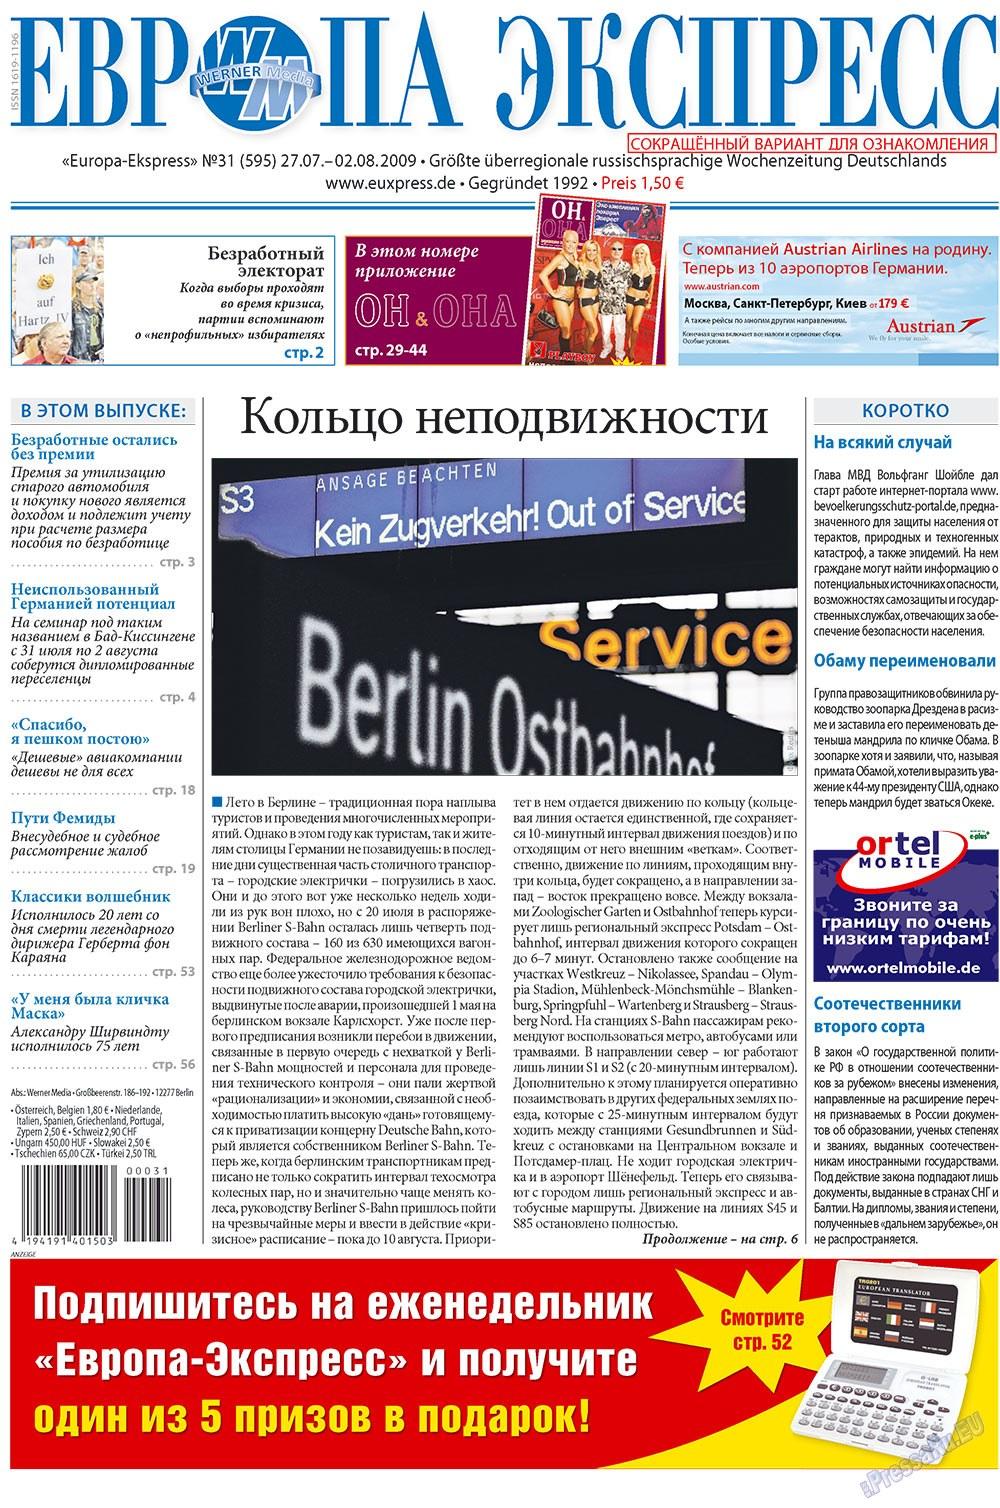 Европа экспресс (газета). 2009 год, номер 31, стр. 1